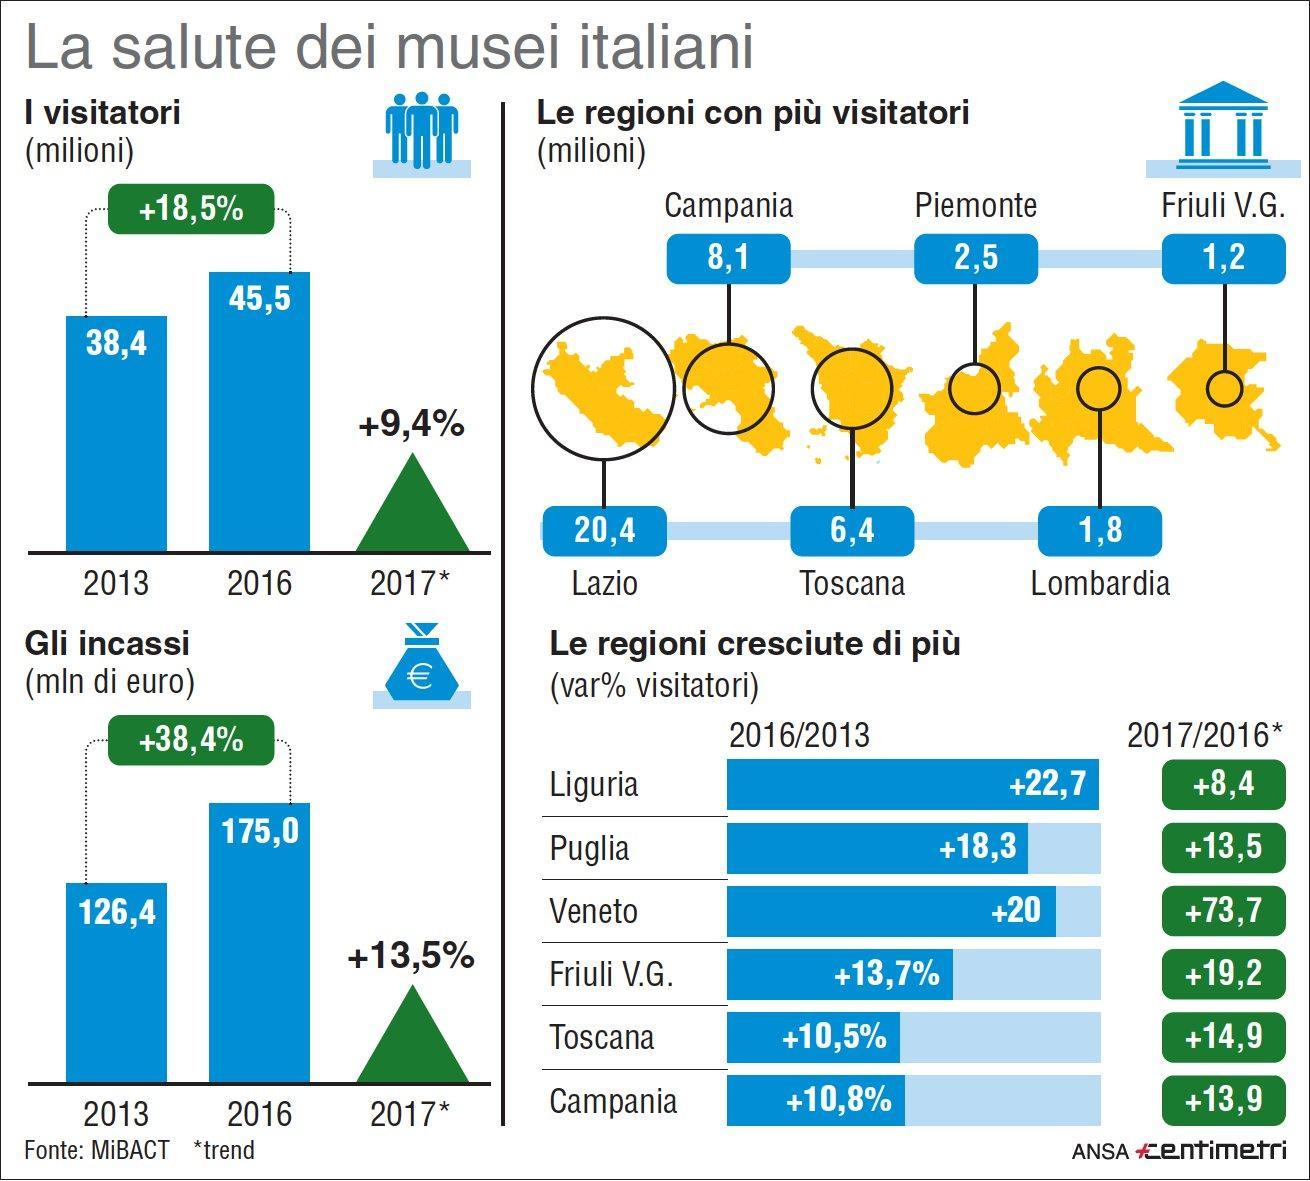 Mibact, i dati sui musei italiani nel 2016-2017